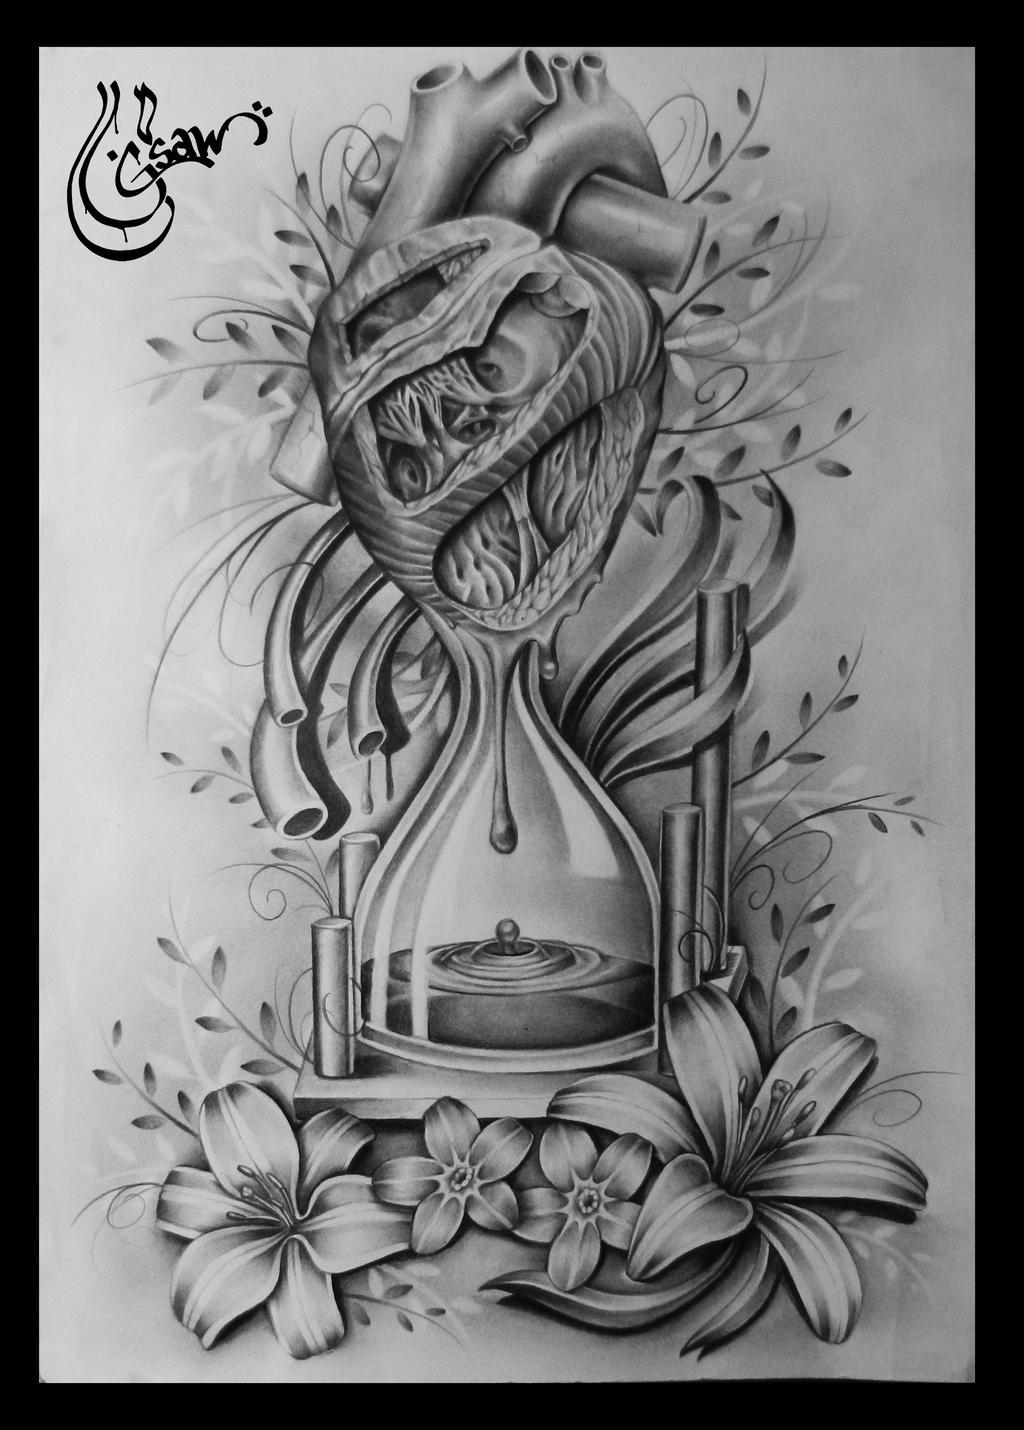 Grandfather Clock Sketch Gsaw's DeviantAr...